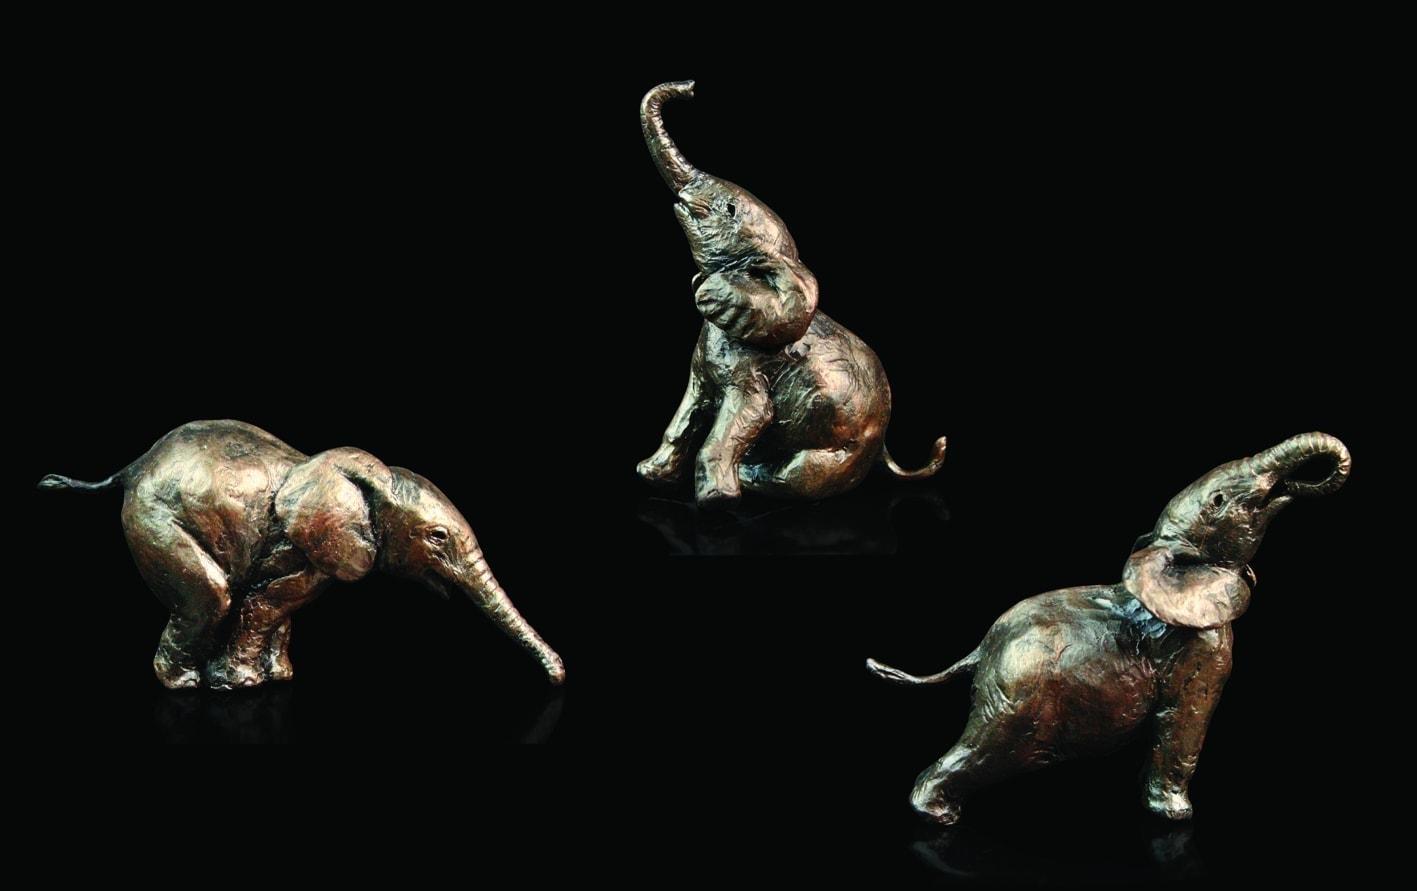 Three Little Elephants by Michael Simpson